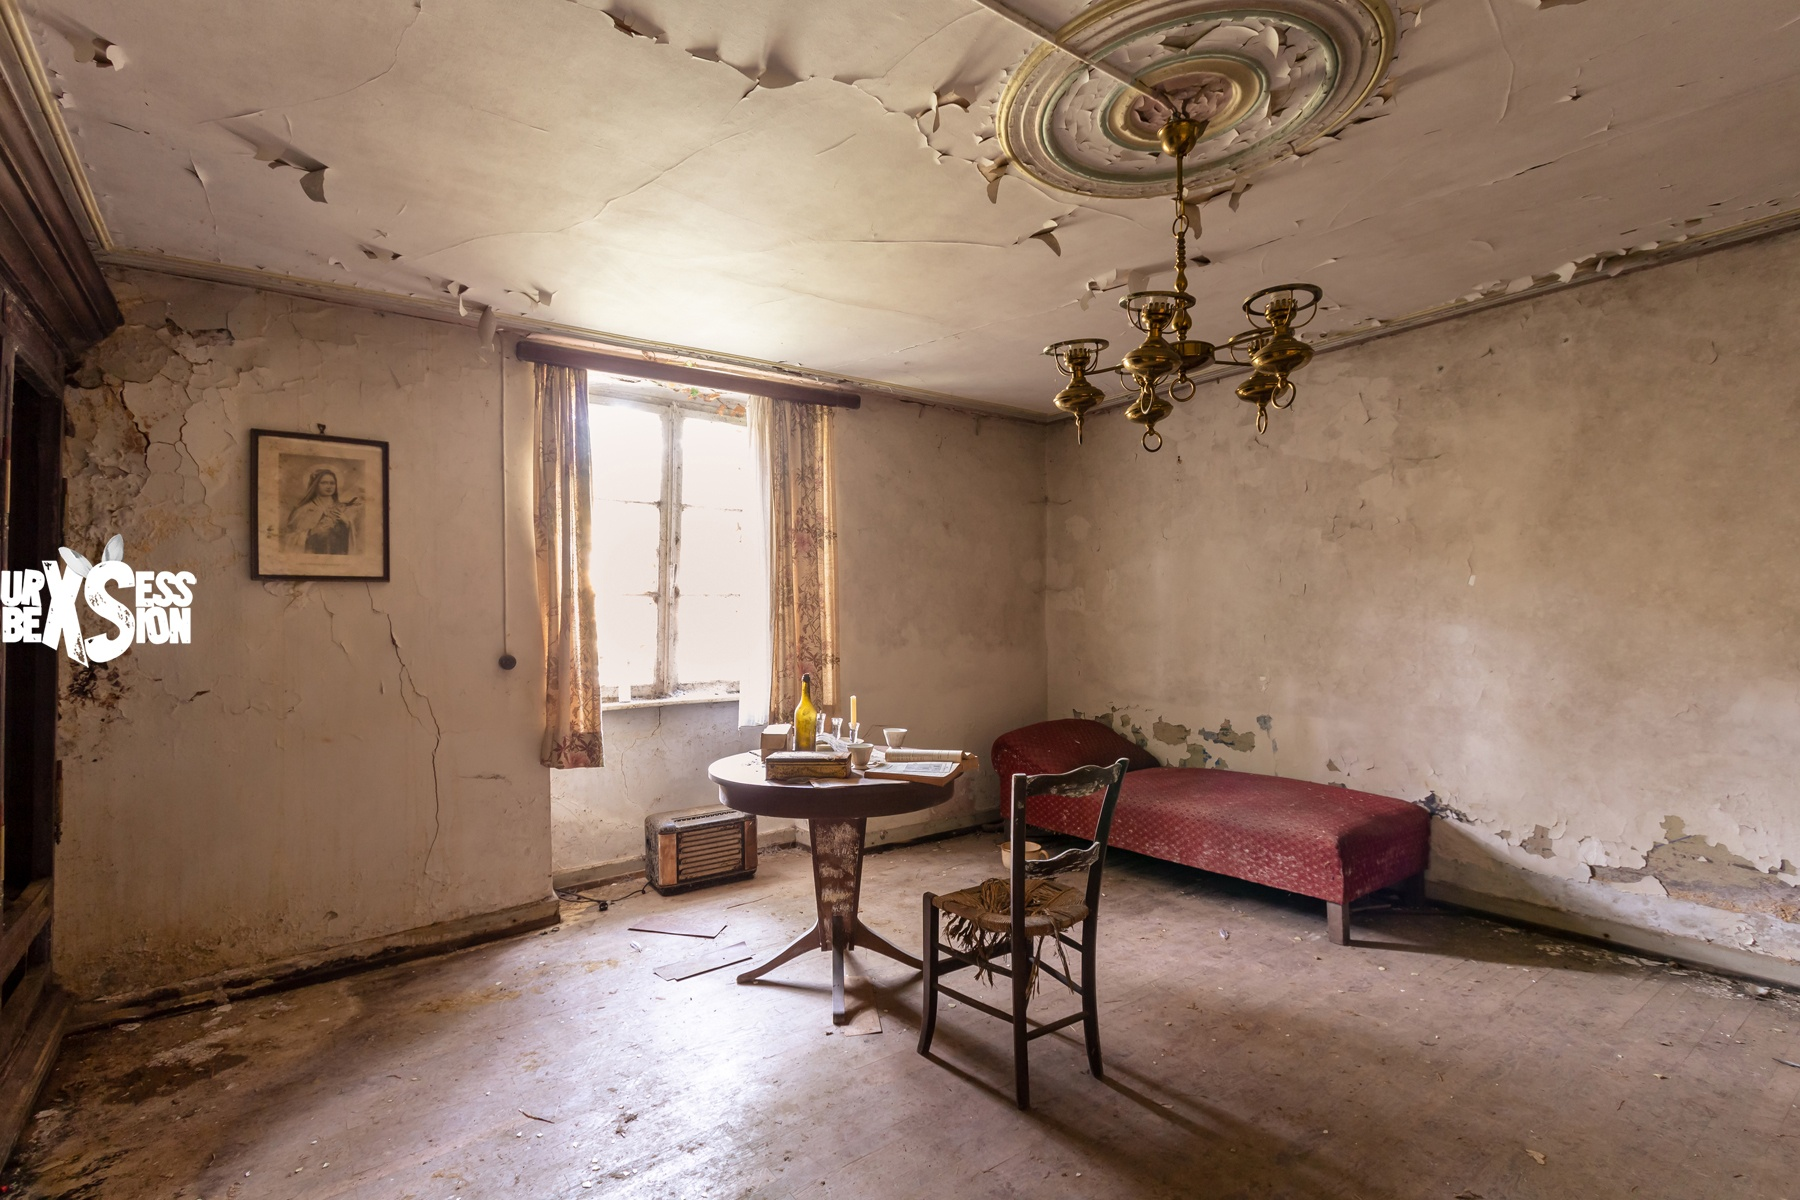 Maison Bodein - Urbex Luxembourg - Reportage : https://urbexsession.com/maison-bodein